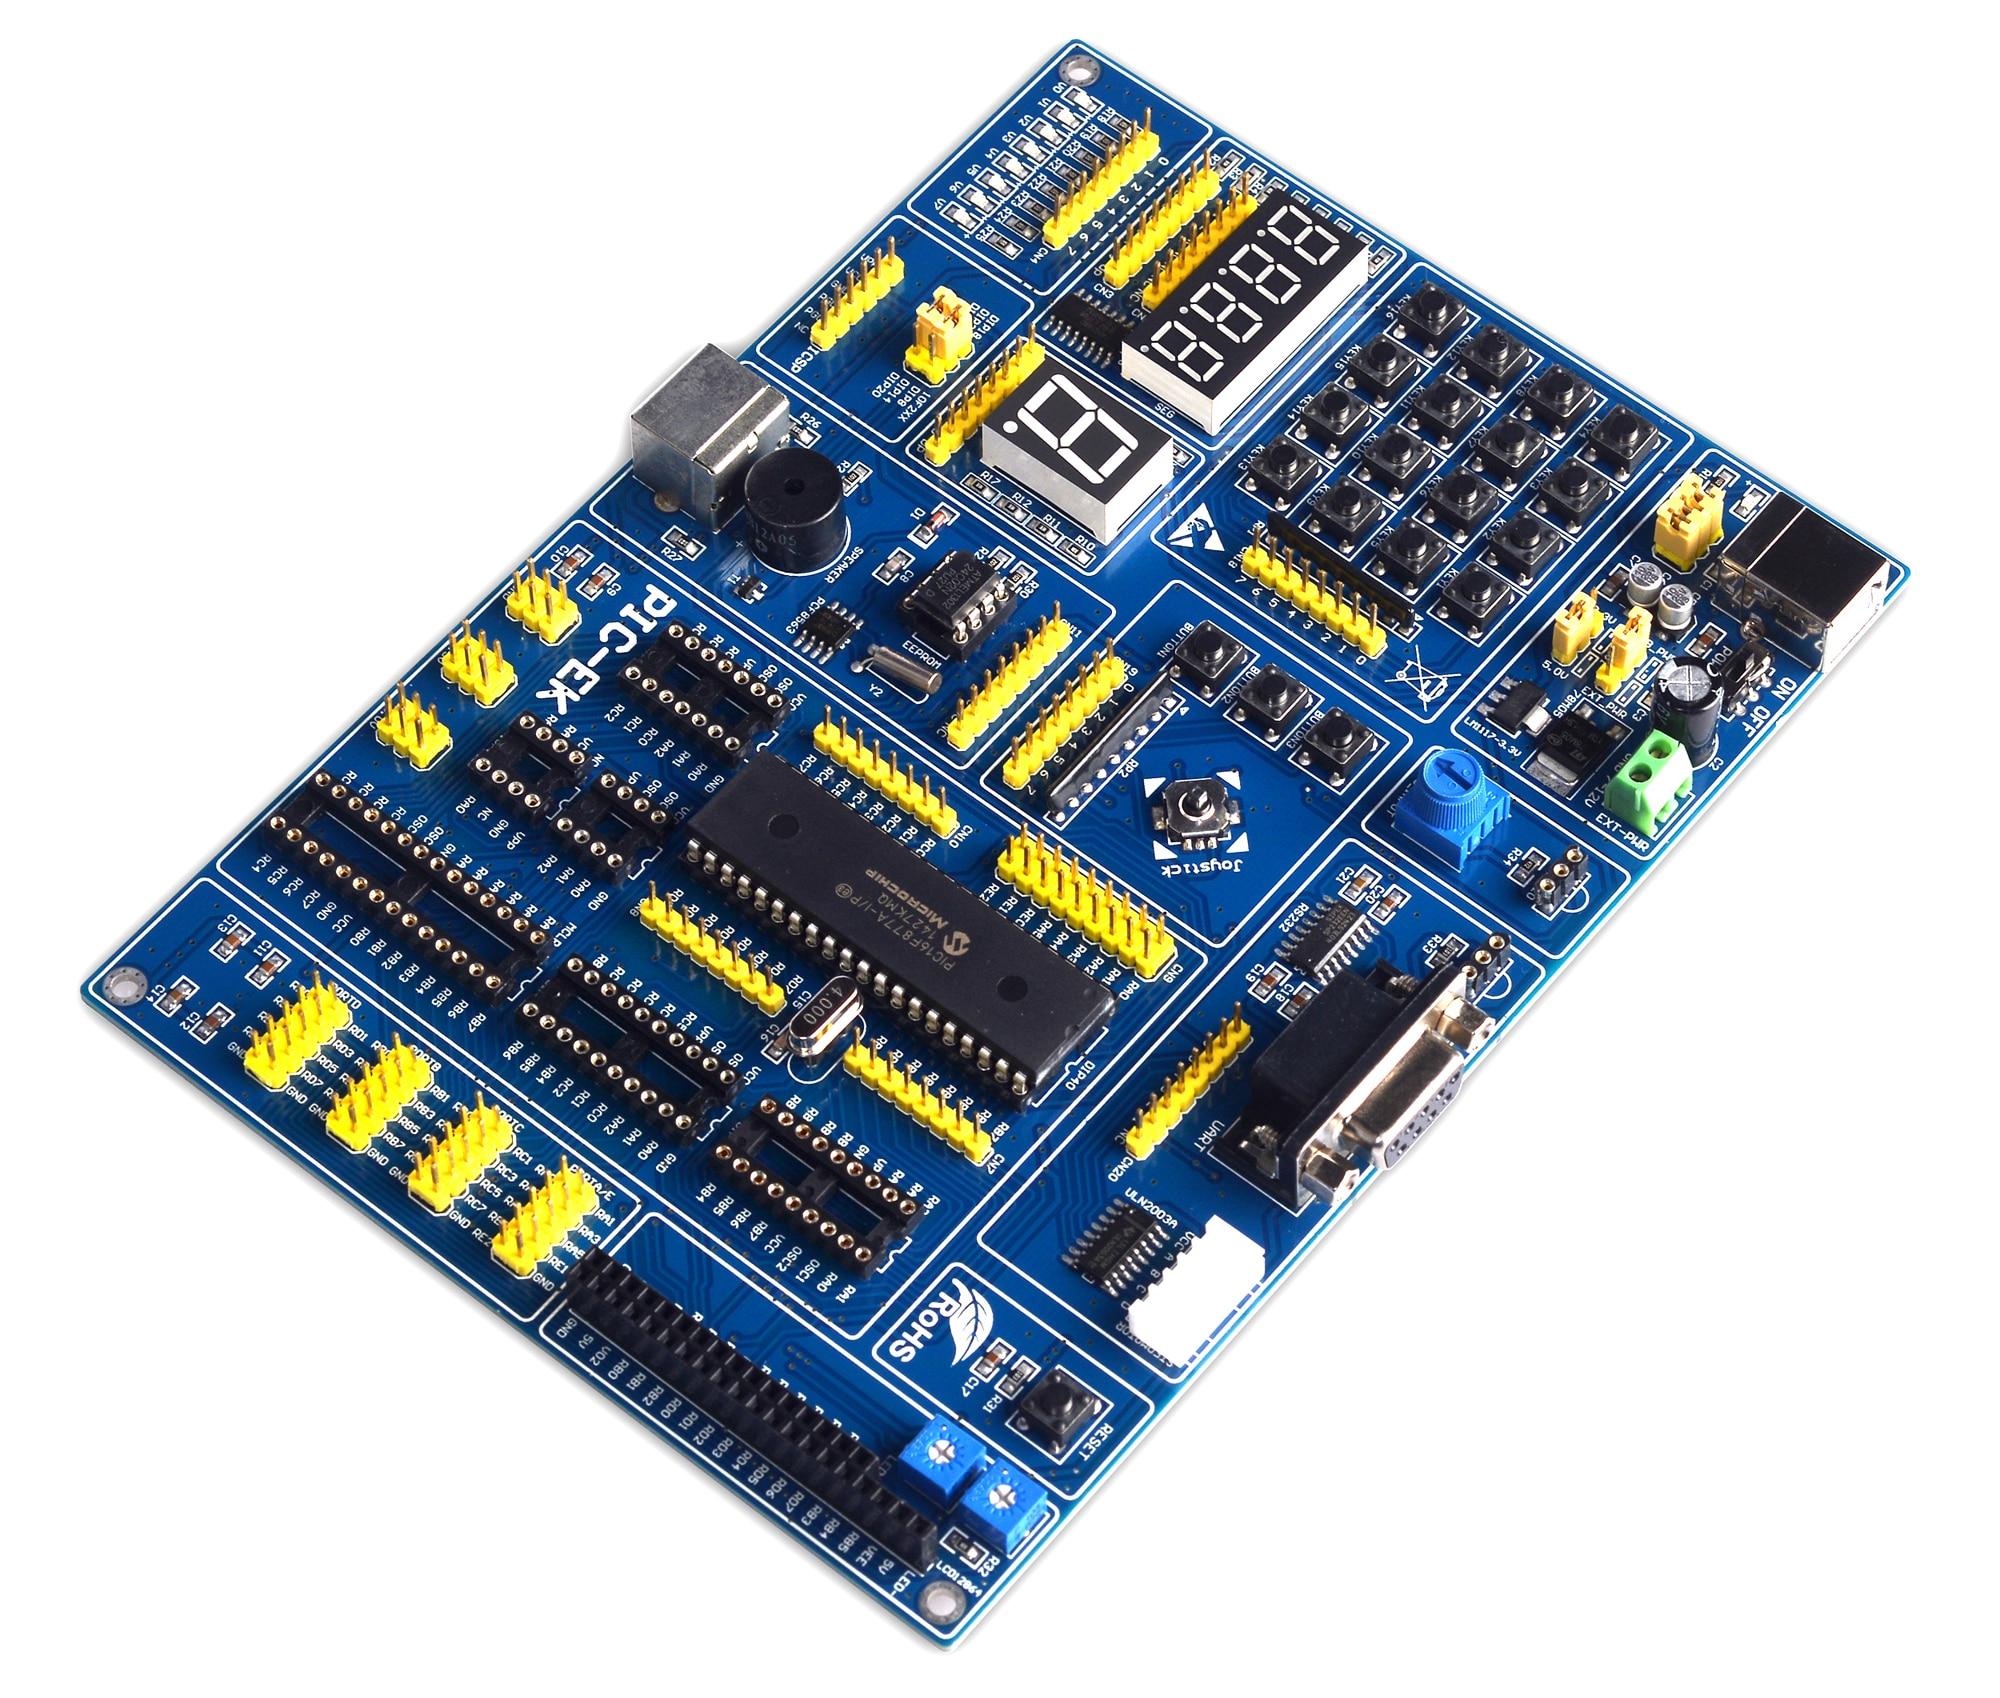 PIC aprendizaje sobre microcontroladores USB Placa de desarrollo PIC-EK con PIC18F4550 microcontroladores